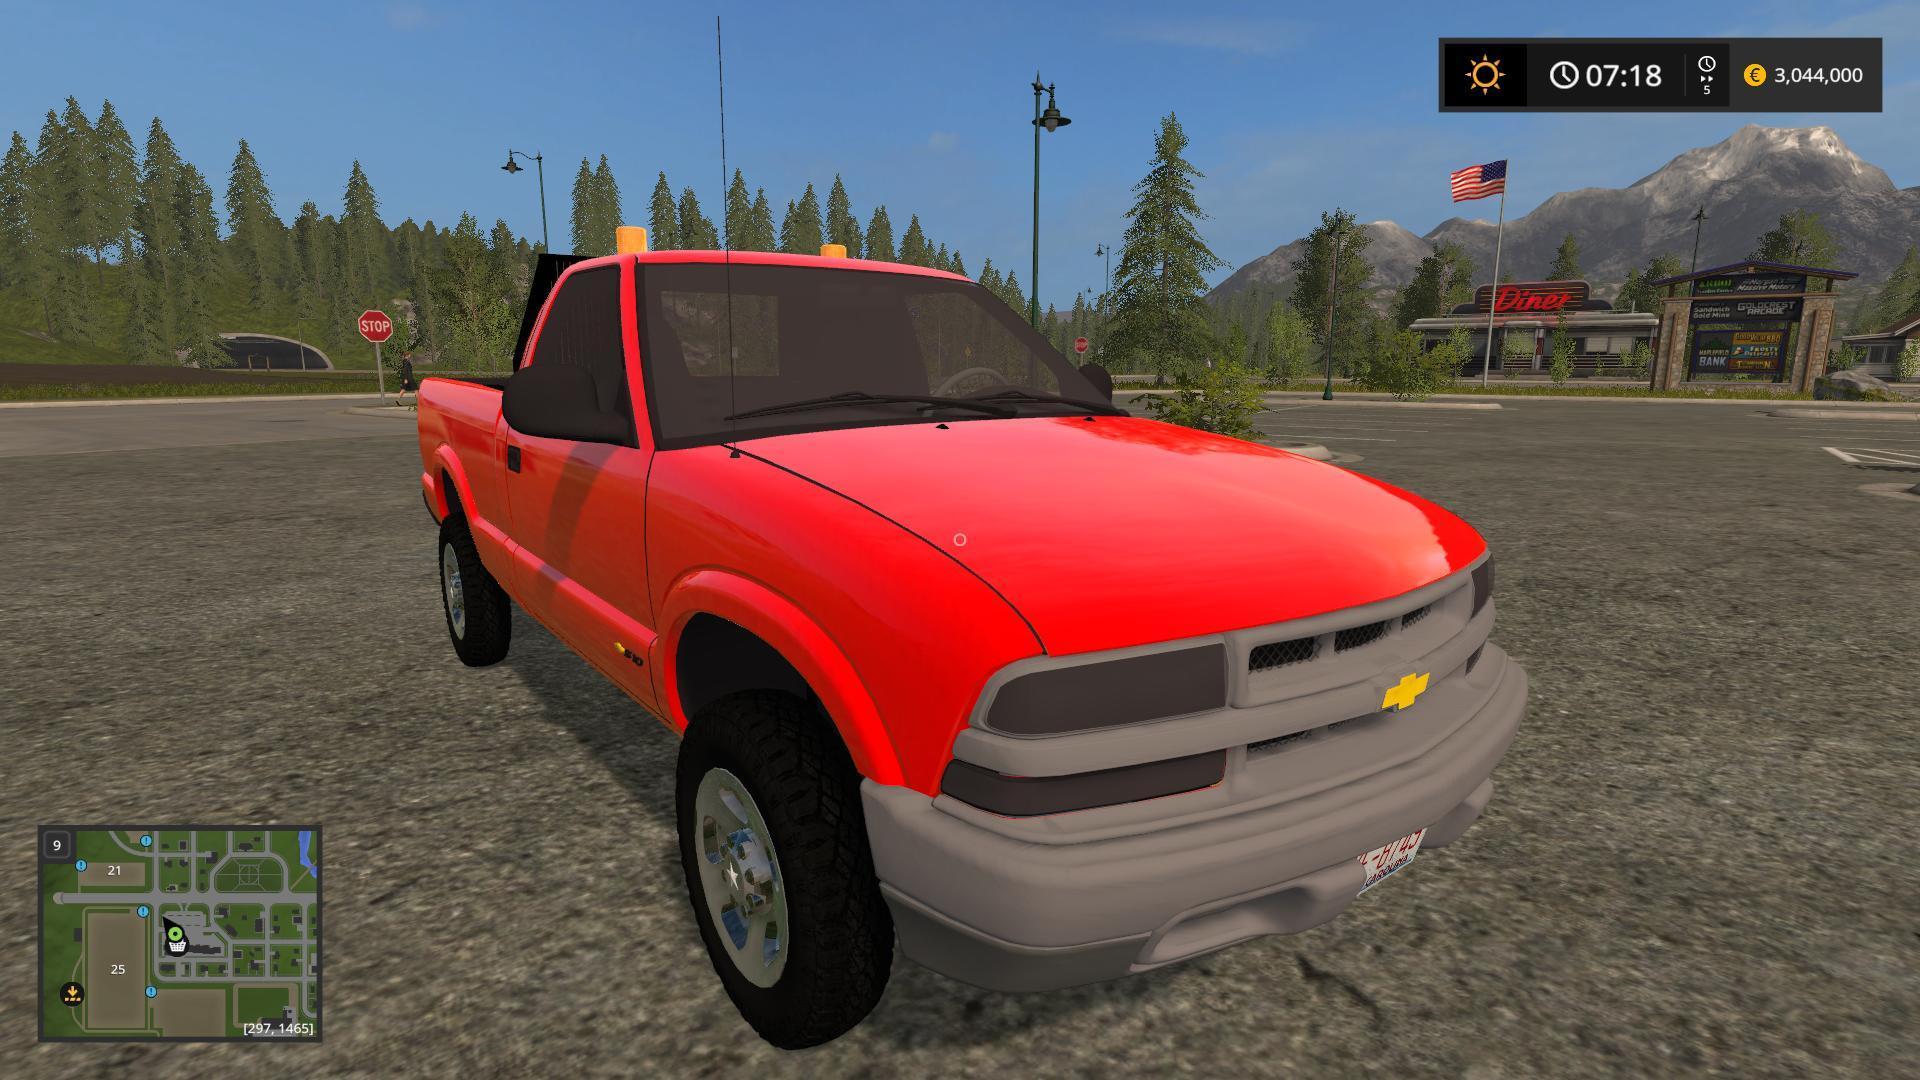 2017 Chevy S10 >> Chevy S10 Pickup Truck V1 0 Fs17 Farming Simulator 17 Mod